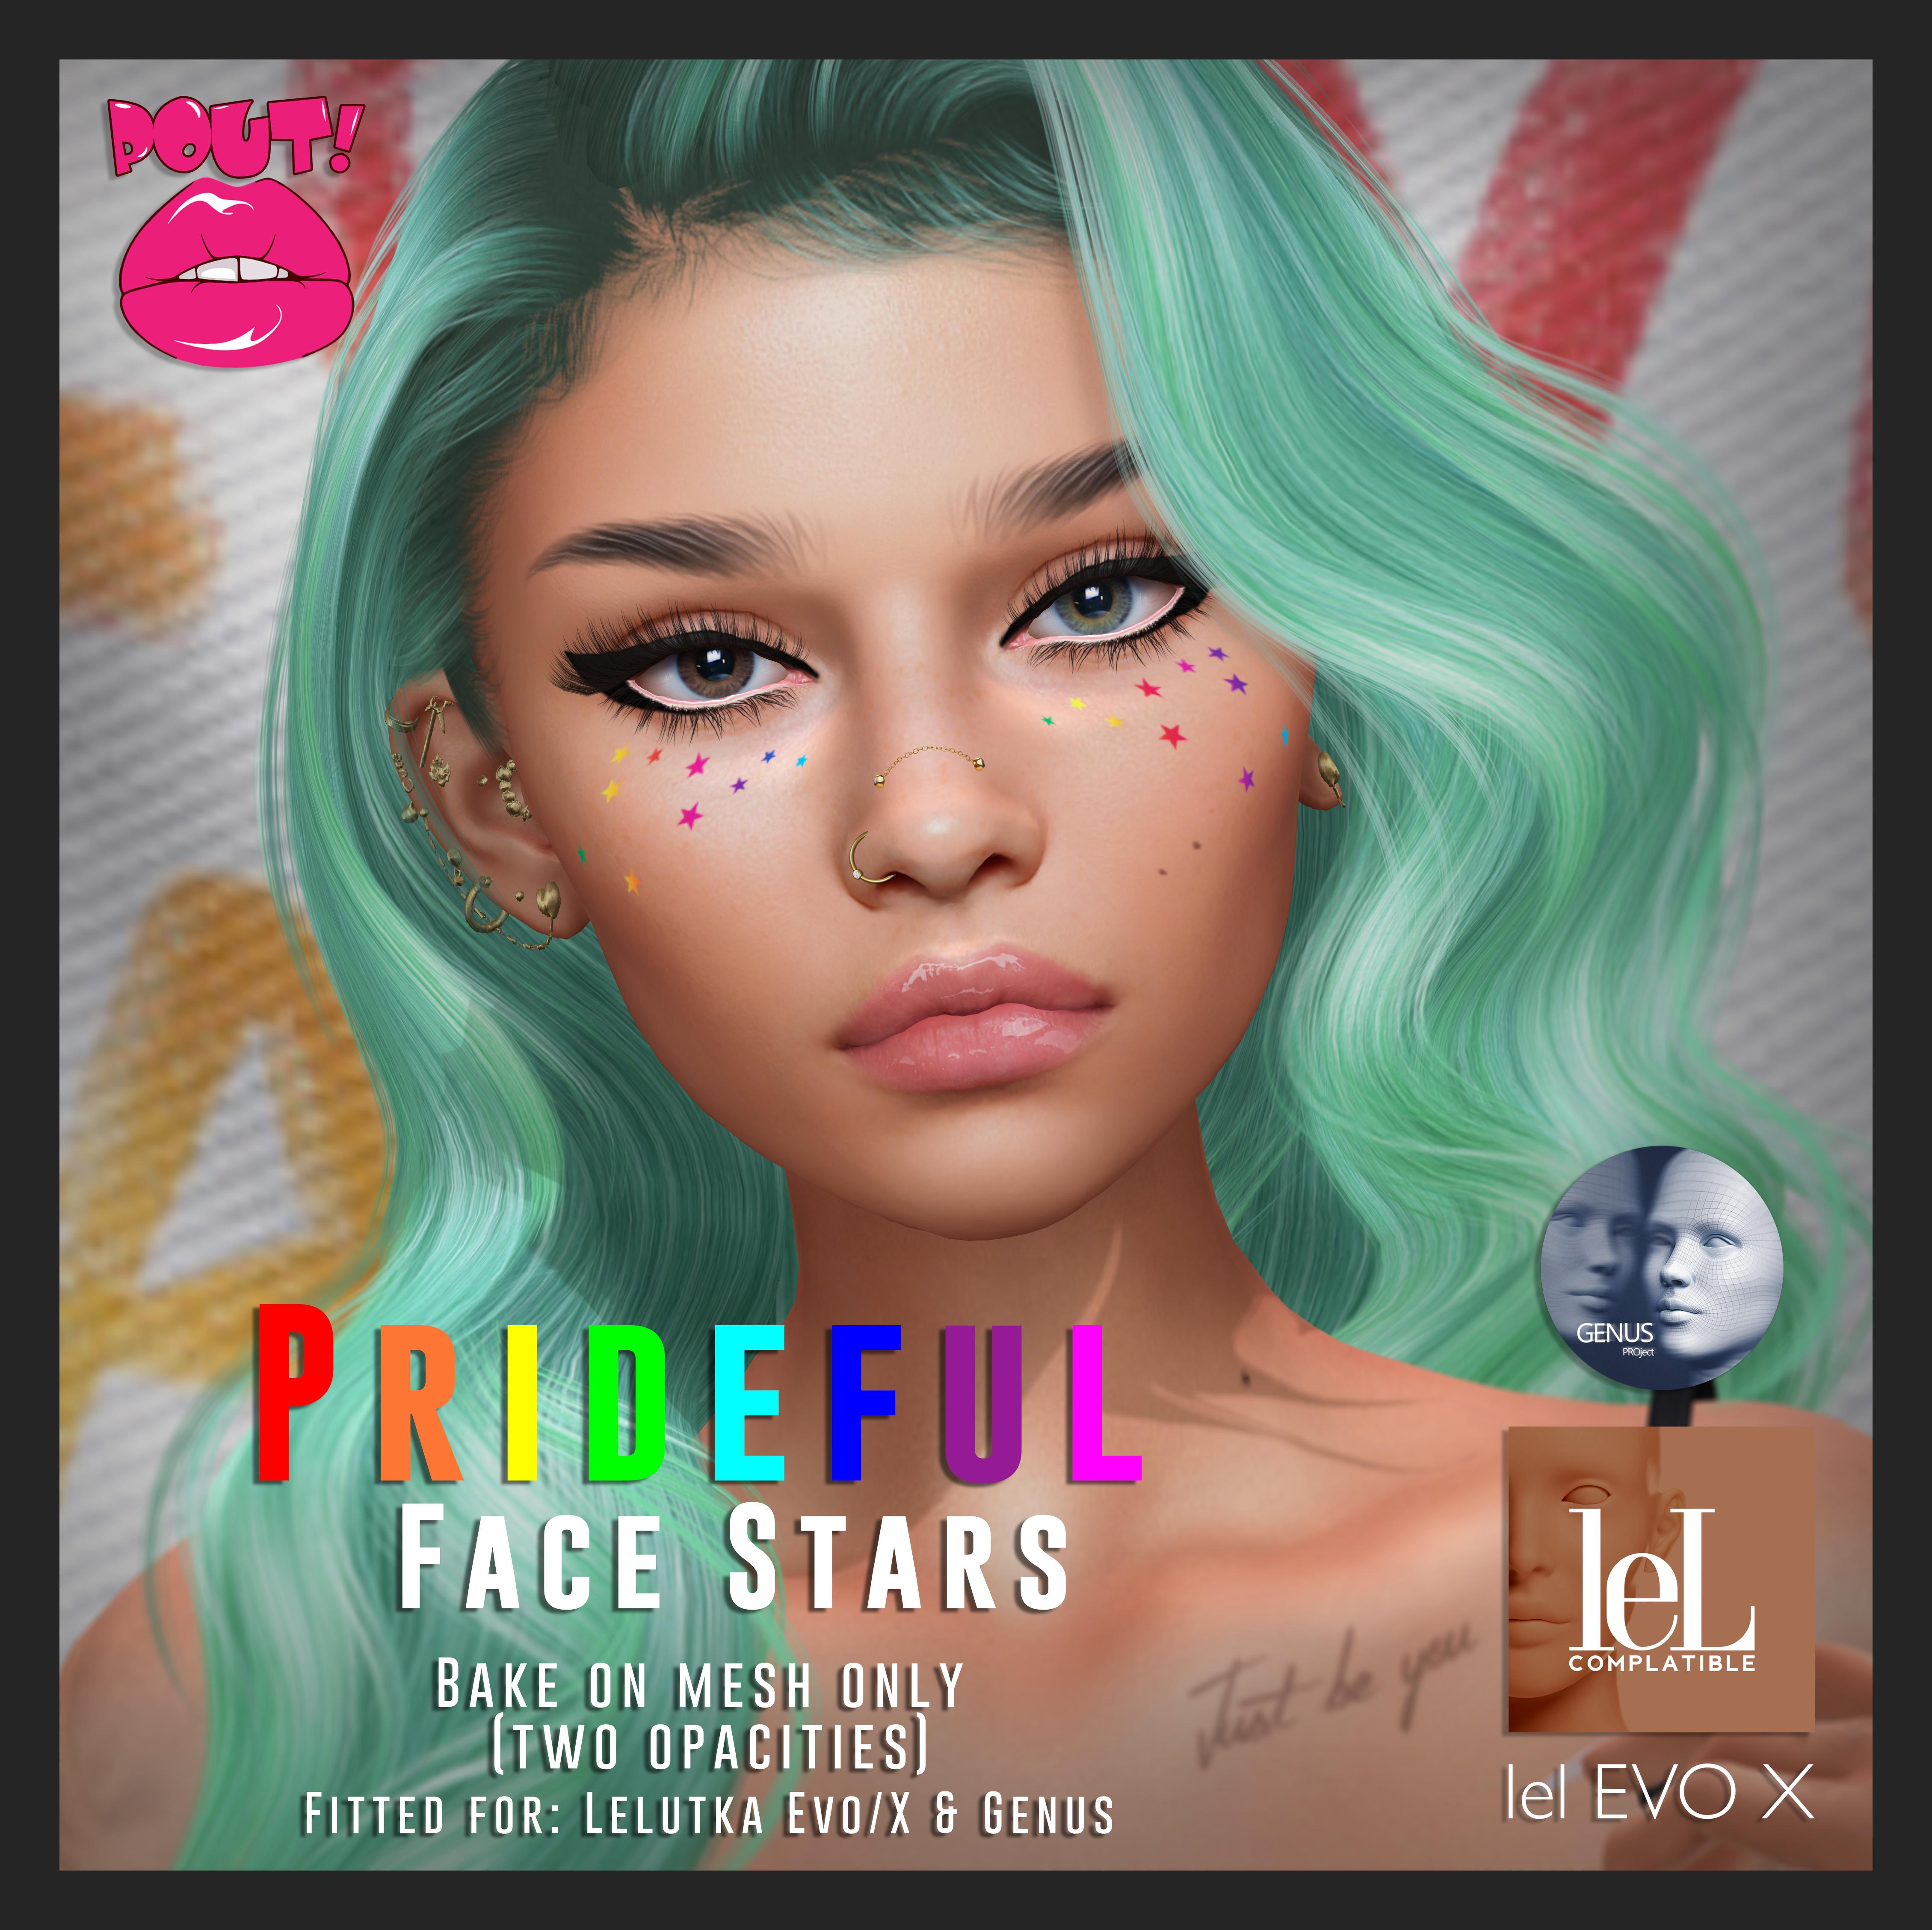 [POUT!] prideful face Stars